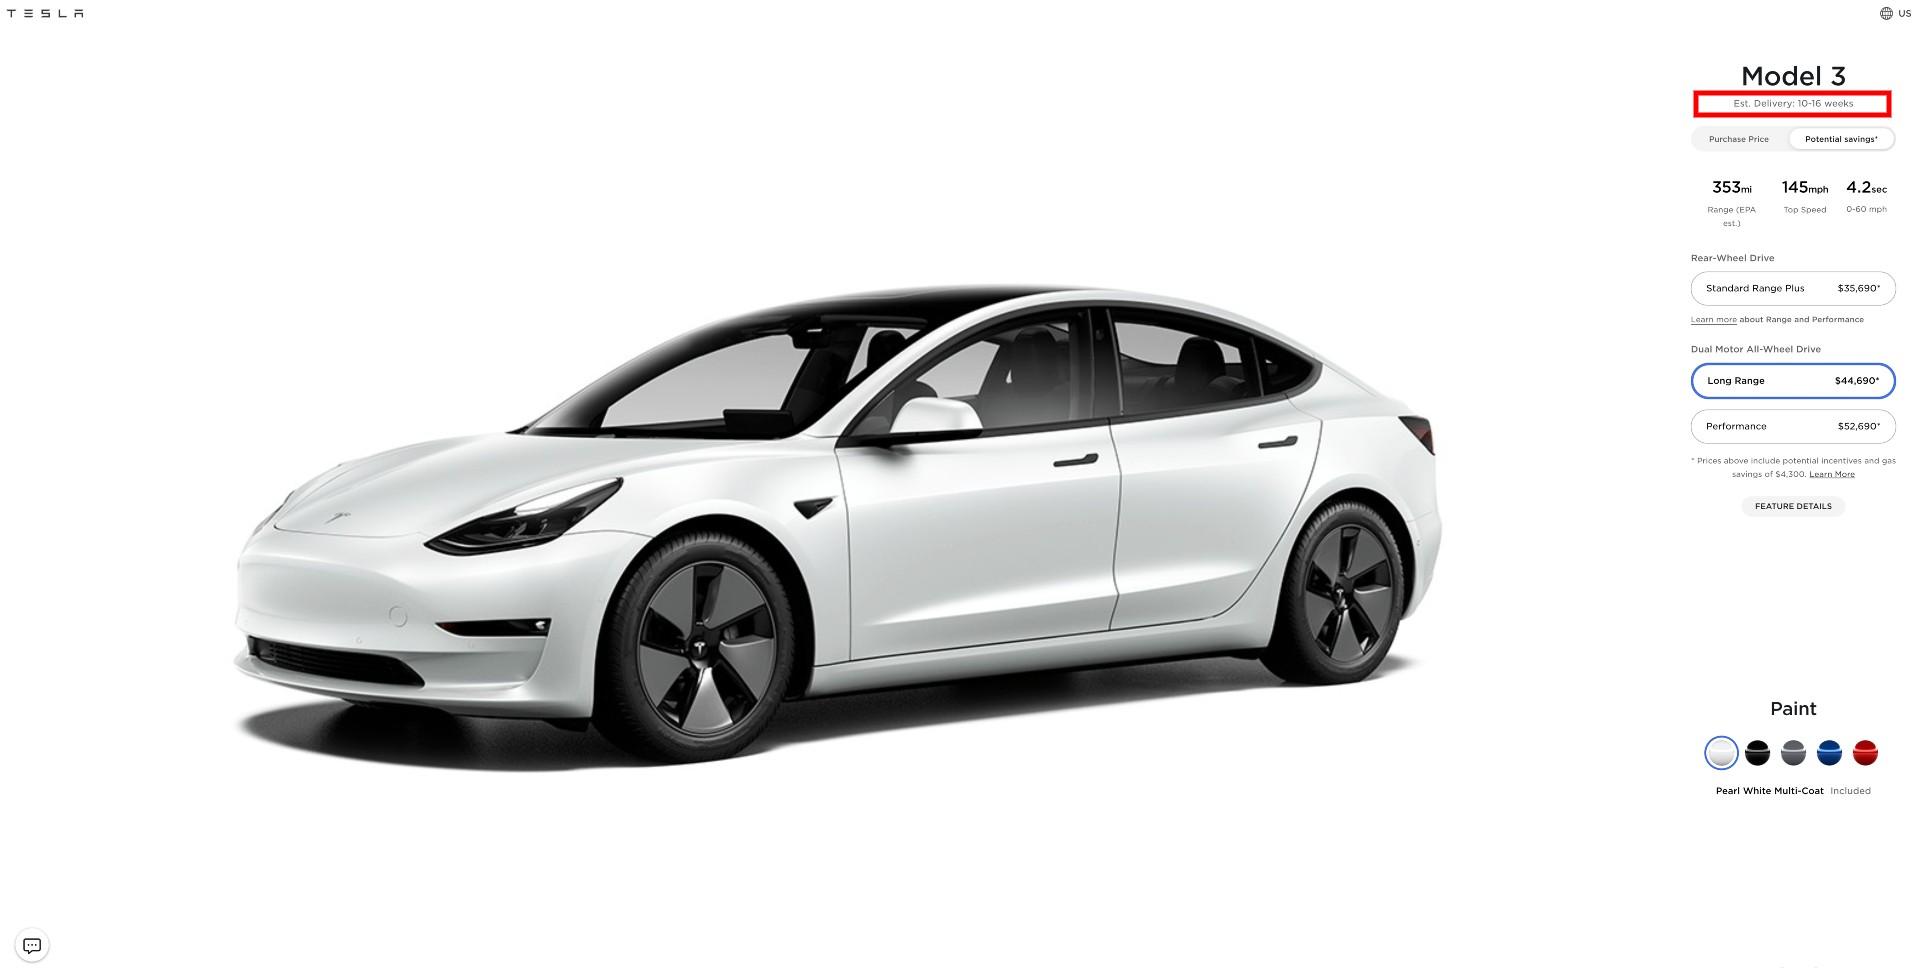 tesla-model-3-long-range-demand-july-2021